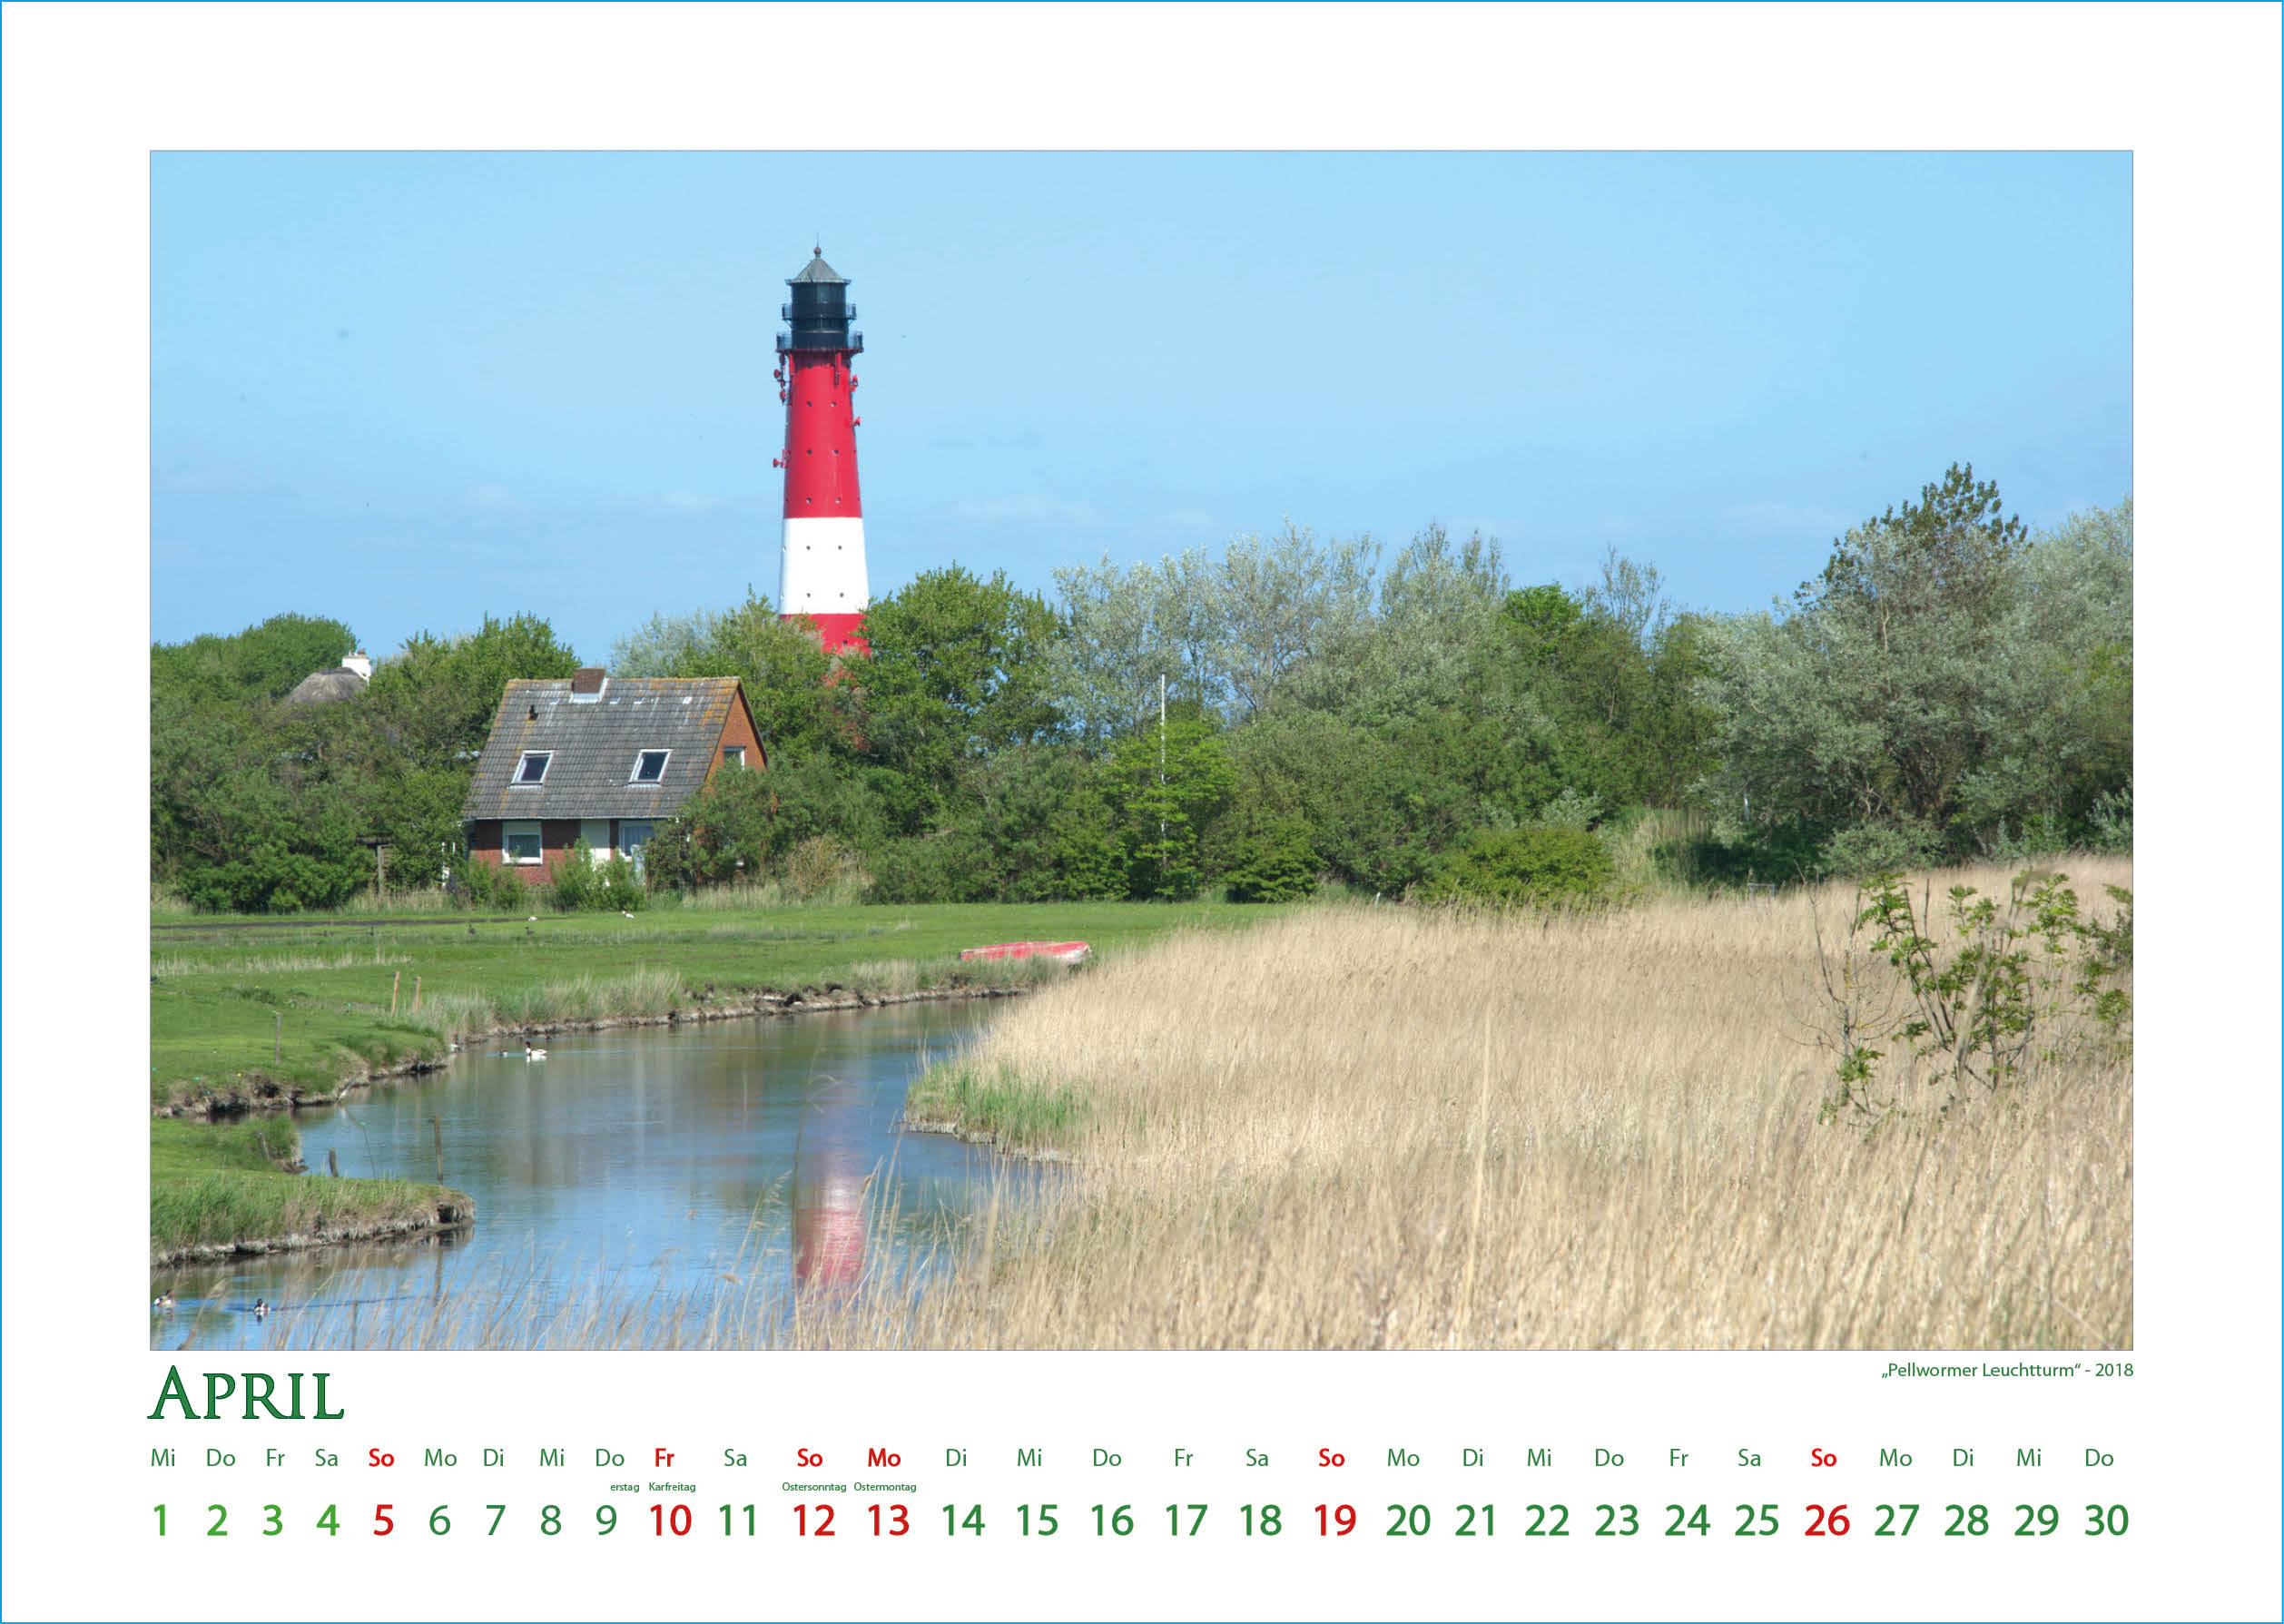 Pellwormer Leuchtturm - Leuchttürme - Kalender 2020 © Katharina Hansen-Gluschitz